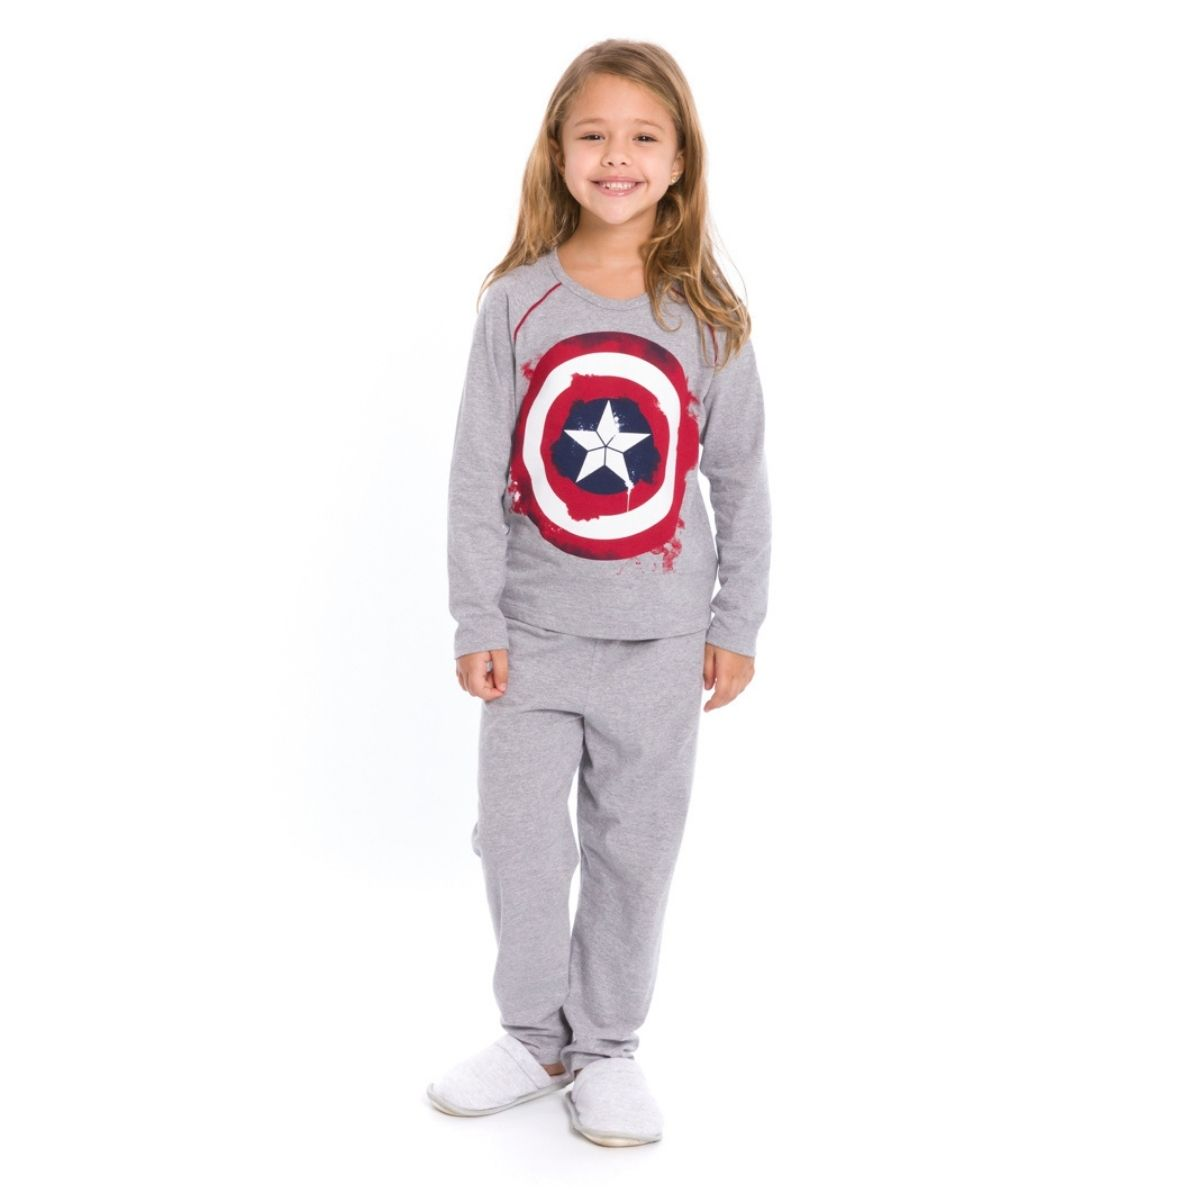 Pijama infantil menina capitã america manga longa quentinho